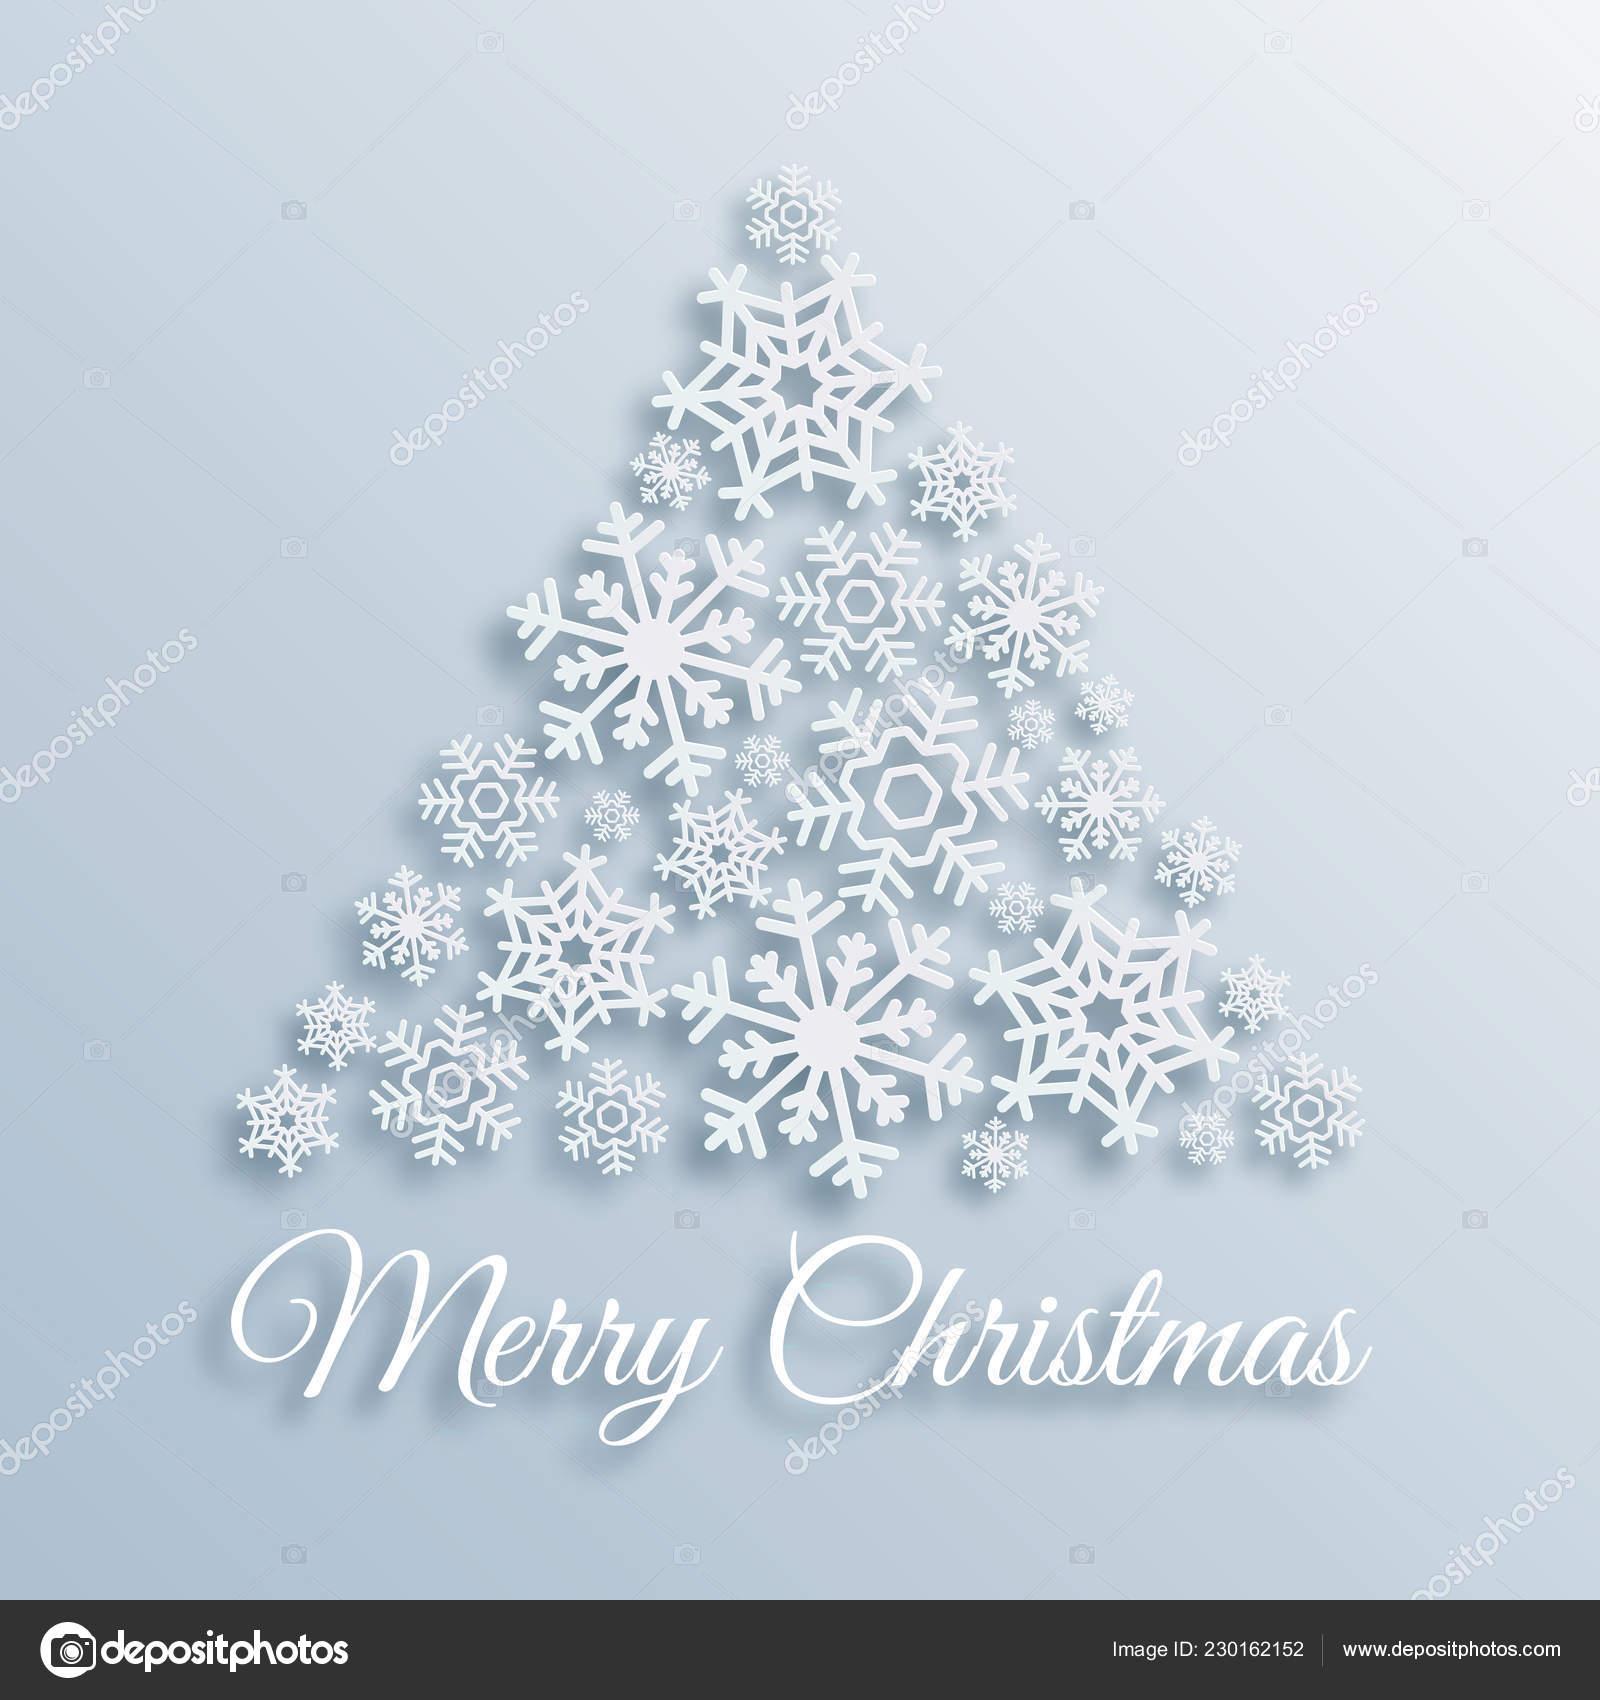 Auguri Di Buon Natale Eleganti.Carta Stile Cartolina D Auguri Di Buon Natale Con L Albero Di Natale